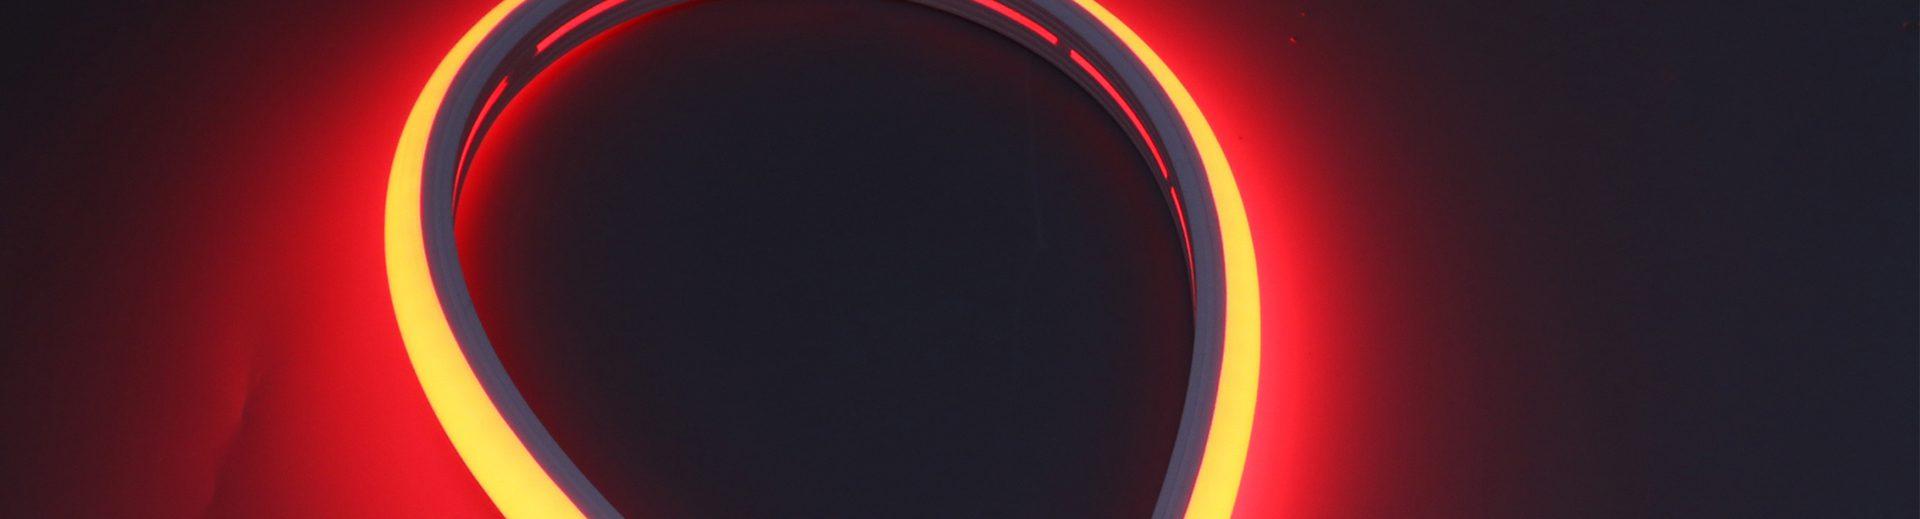 DuraFlex Arch RGB Top Flex_Banner